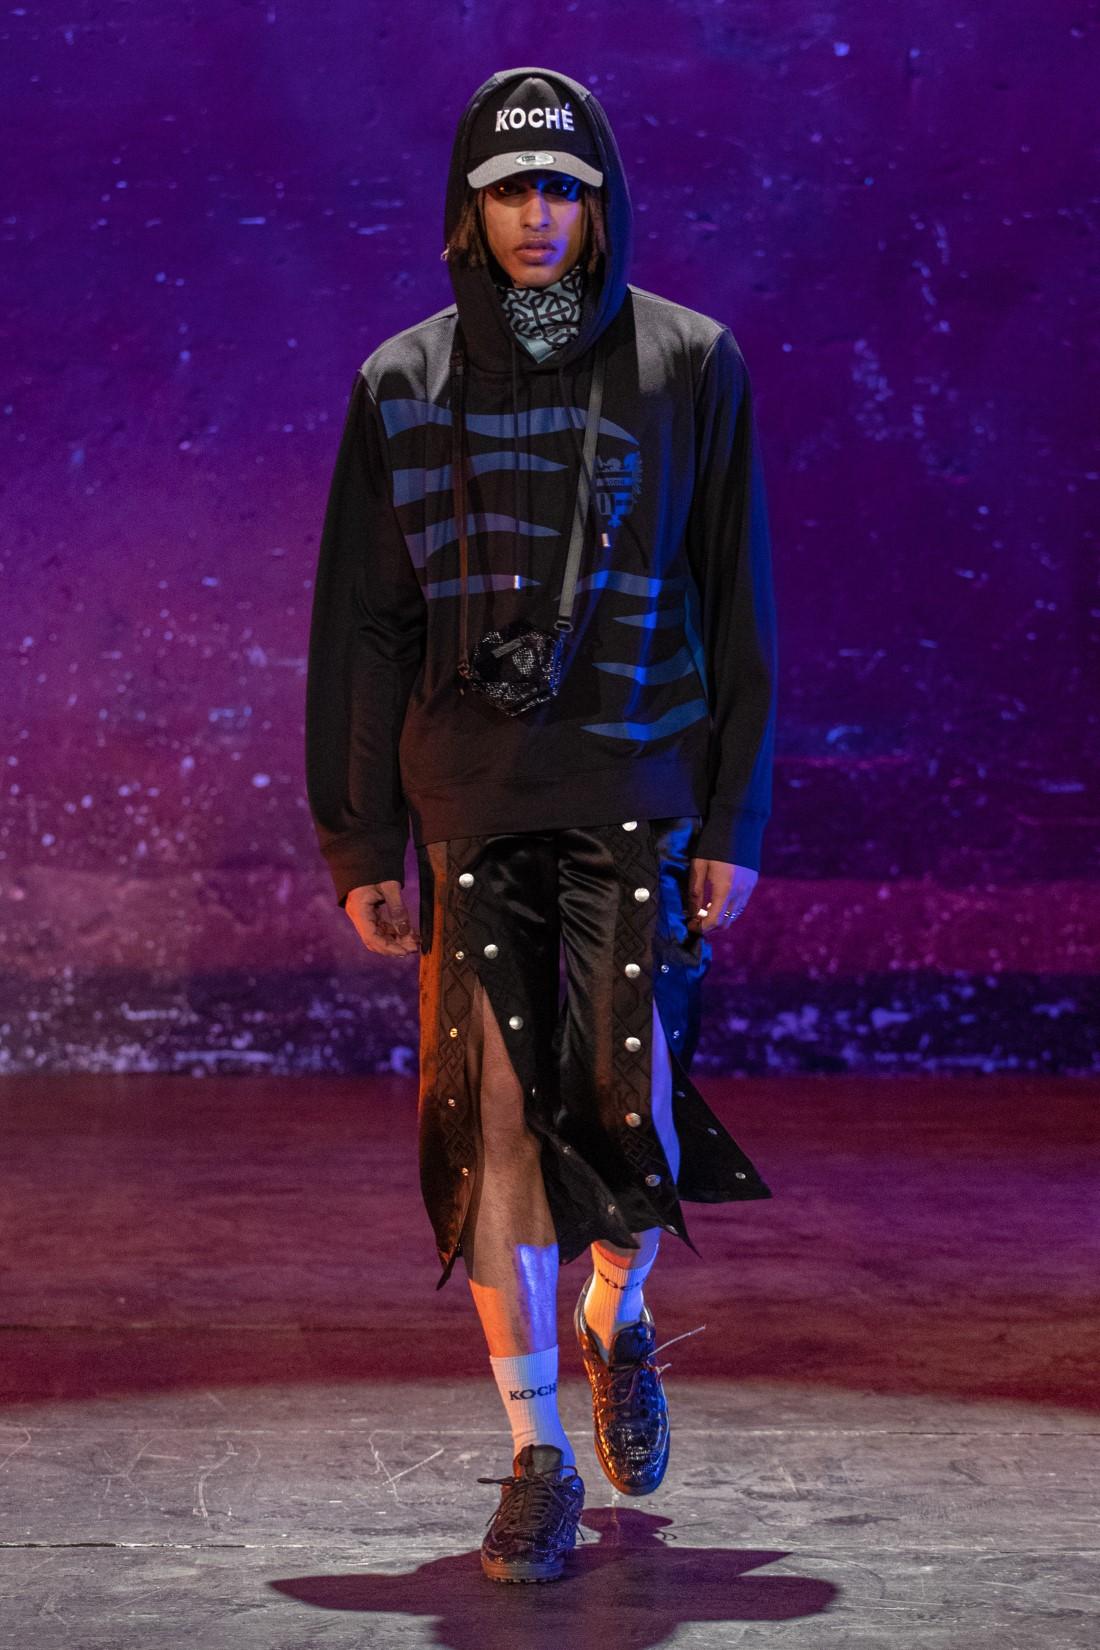 Koche - Automne-Hiver 2021 - 2022 - Paris Fashion Week